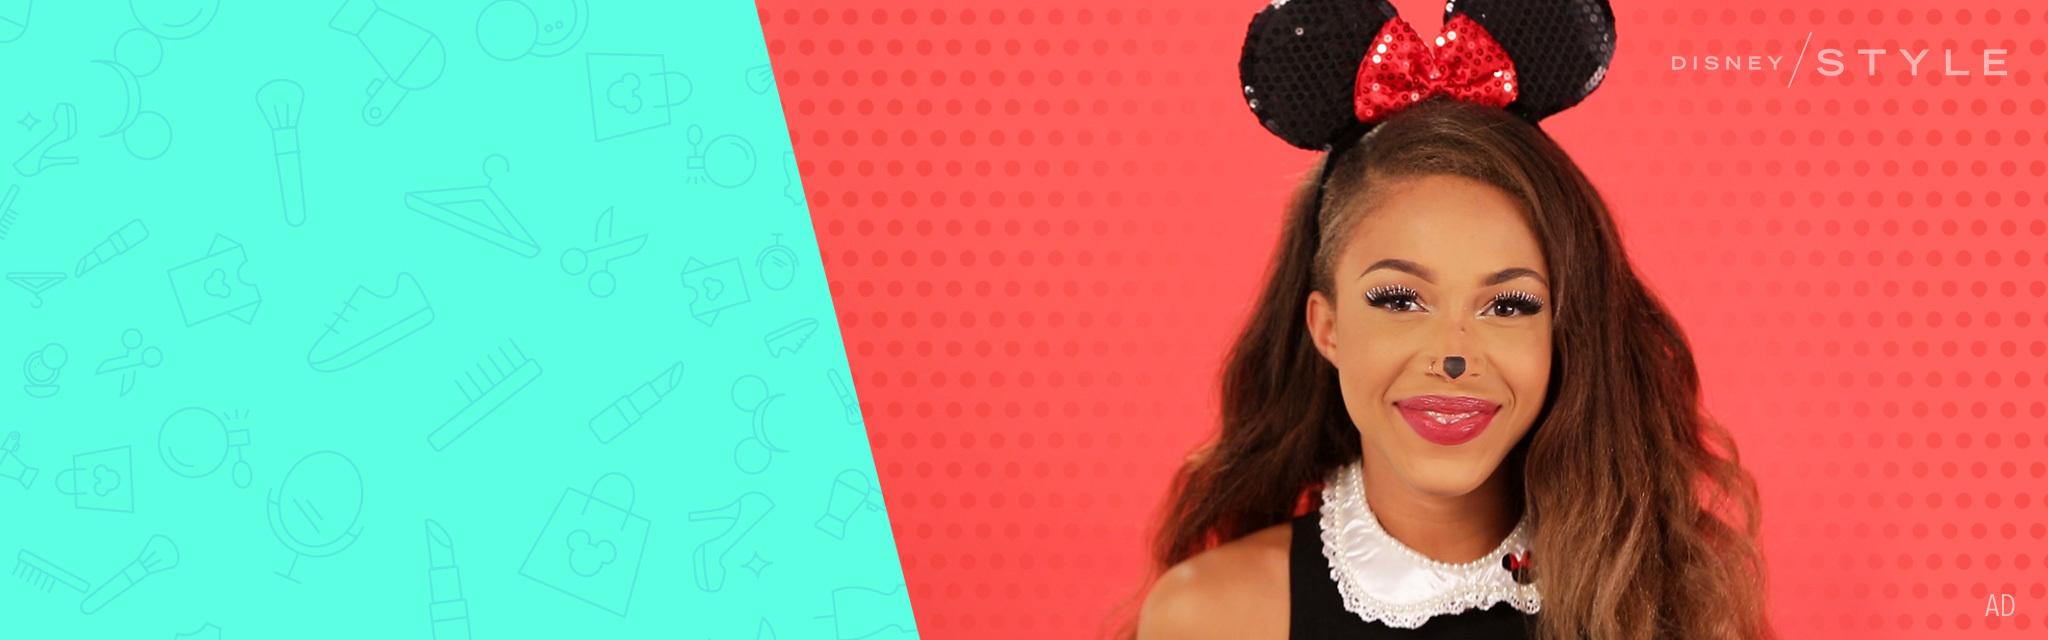 Disney Style - Minnie Mouse Time lapse tranformation - Hero